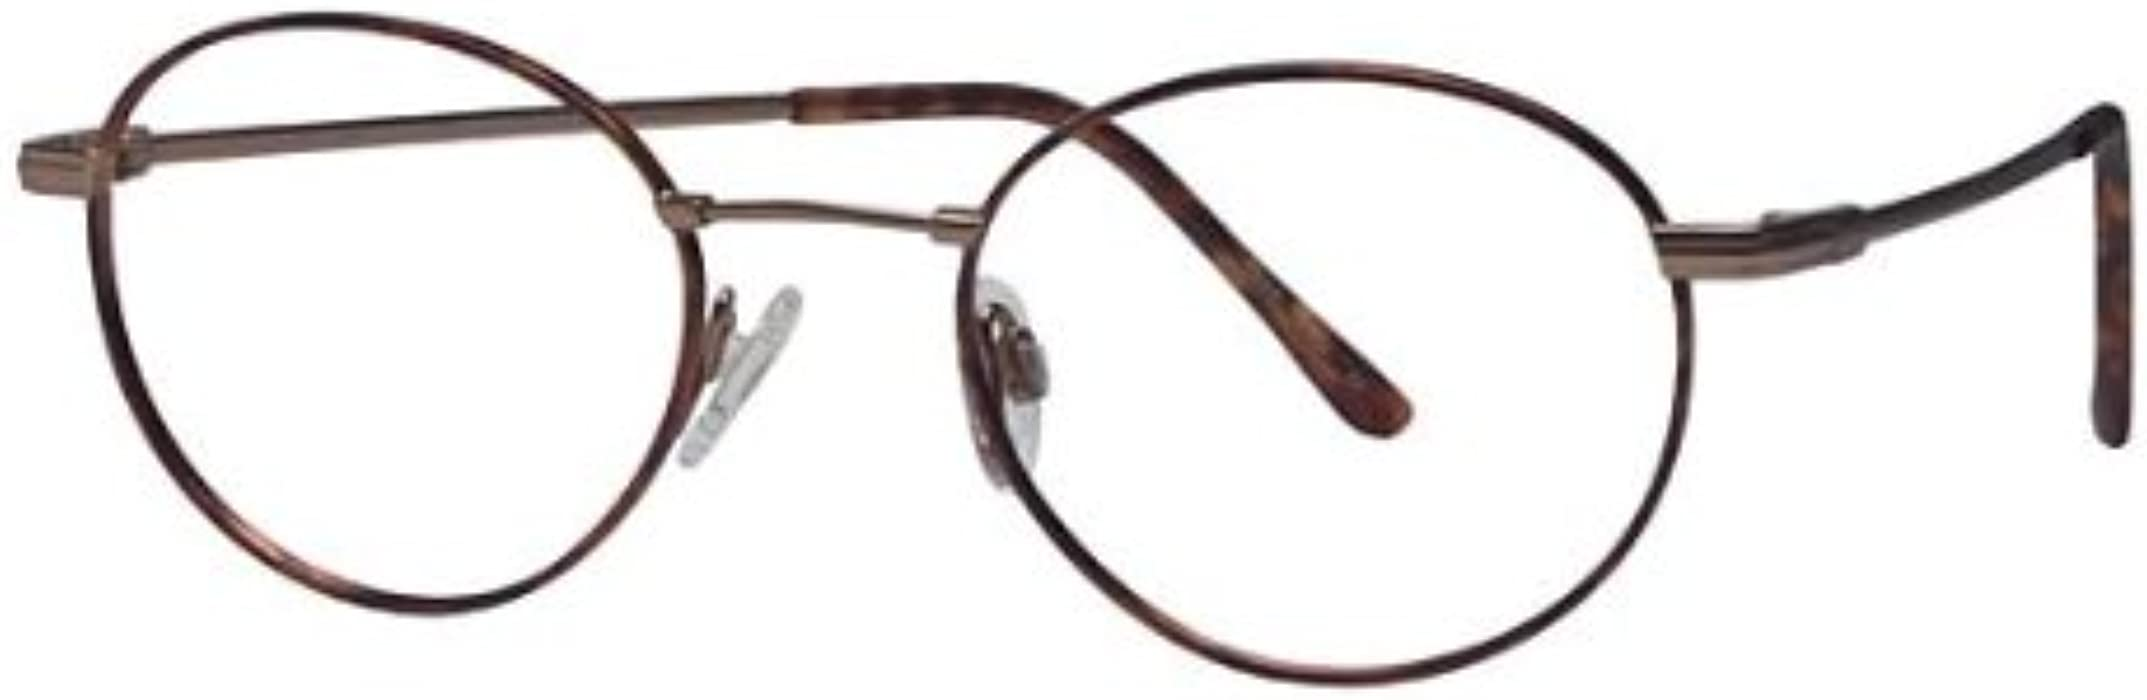 0db43dcd6a Amazon.com  Flexon Autoflex 53 Eyeglasses 215 Tortoise Bronze Demo ...